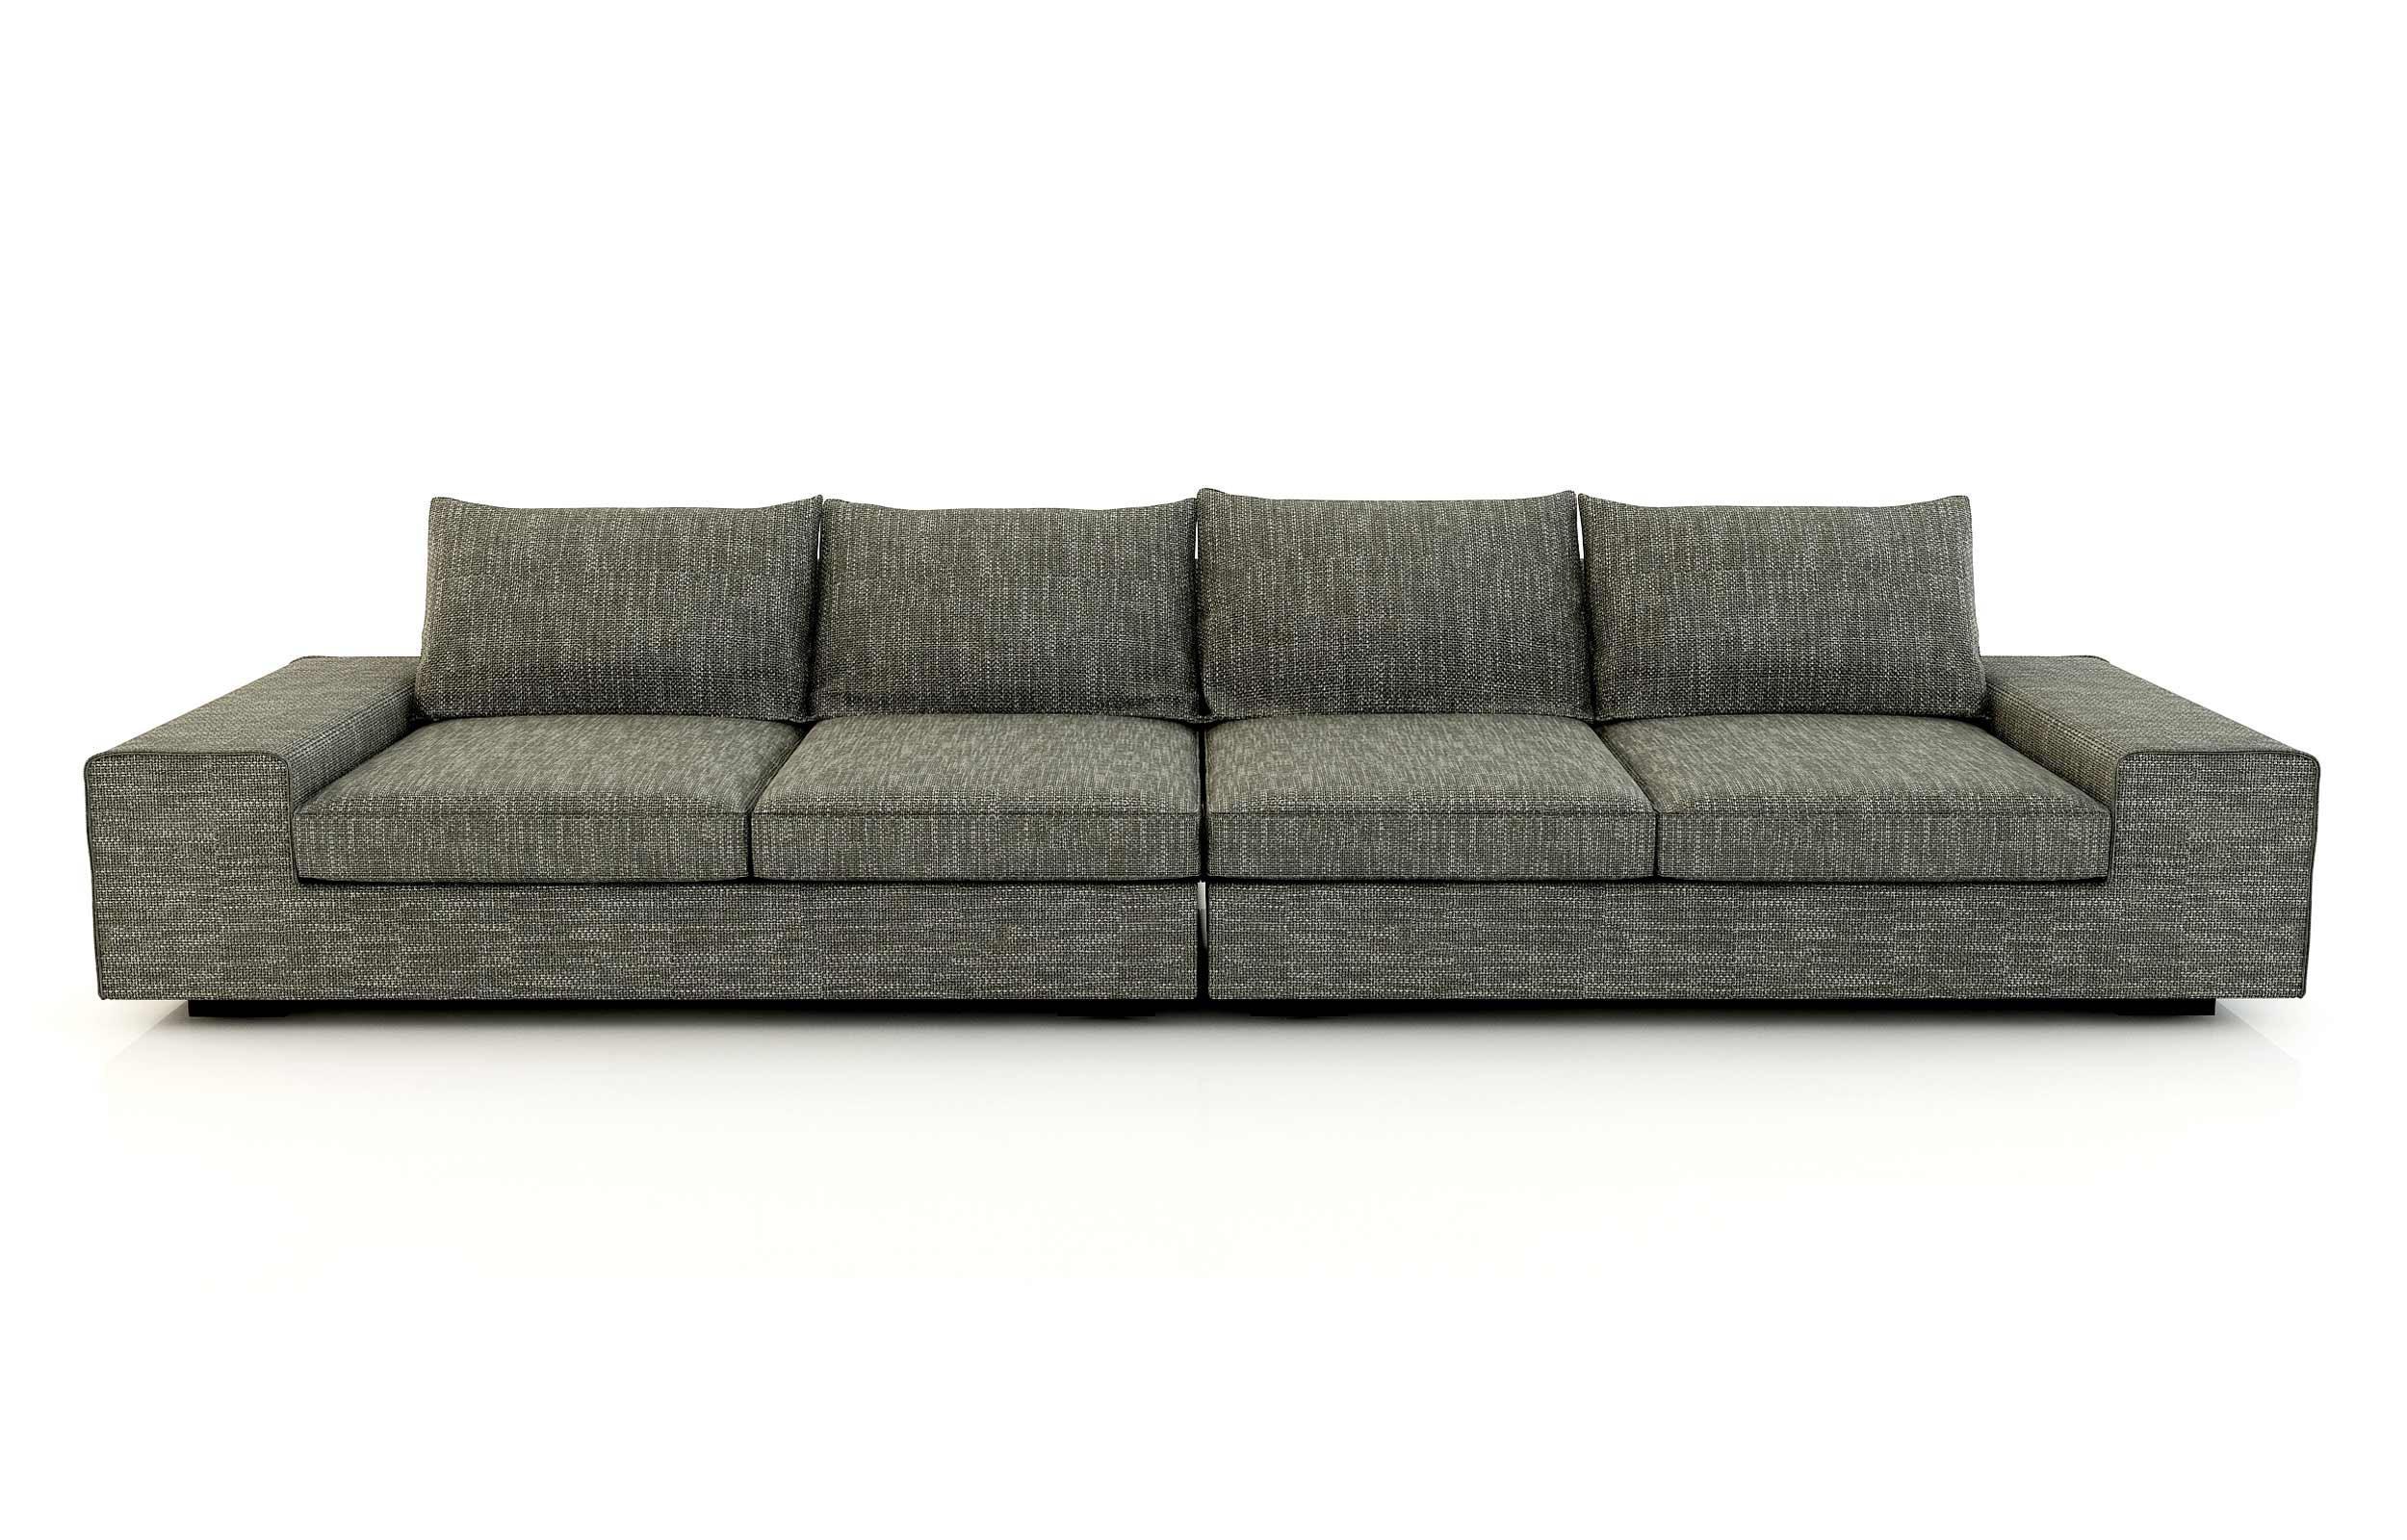 Blumen Sofa 2 Piece | Viesso With Regard To 2 Piece Sofas (View 12 of 20)